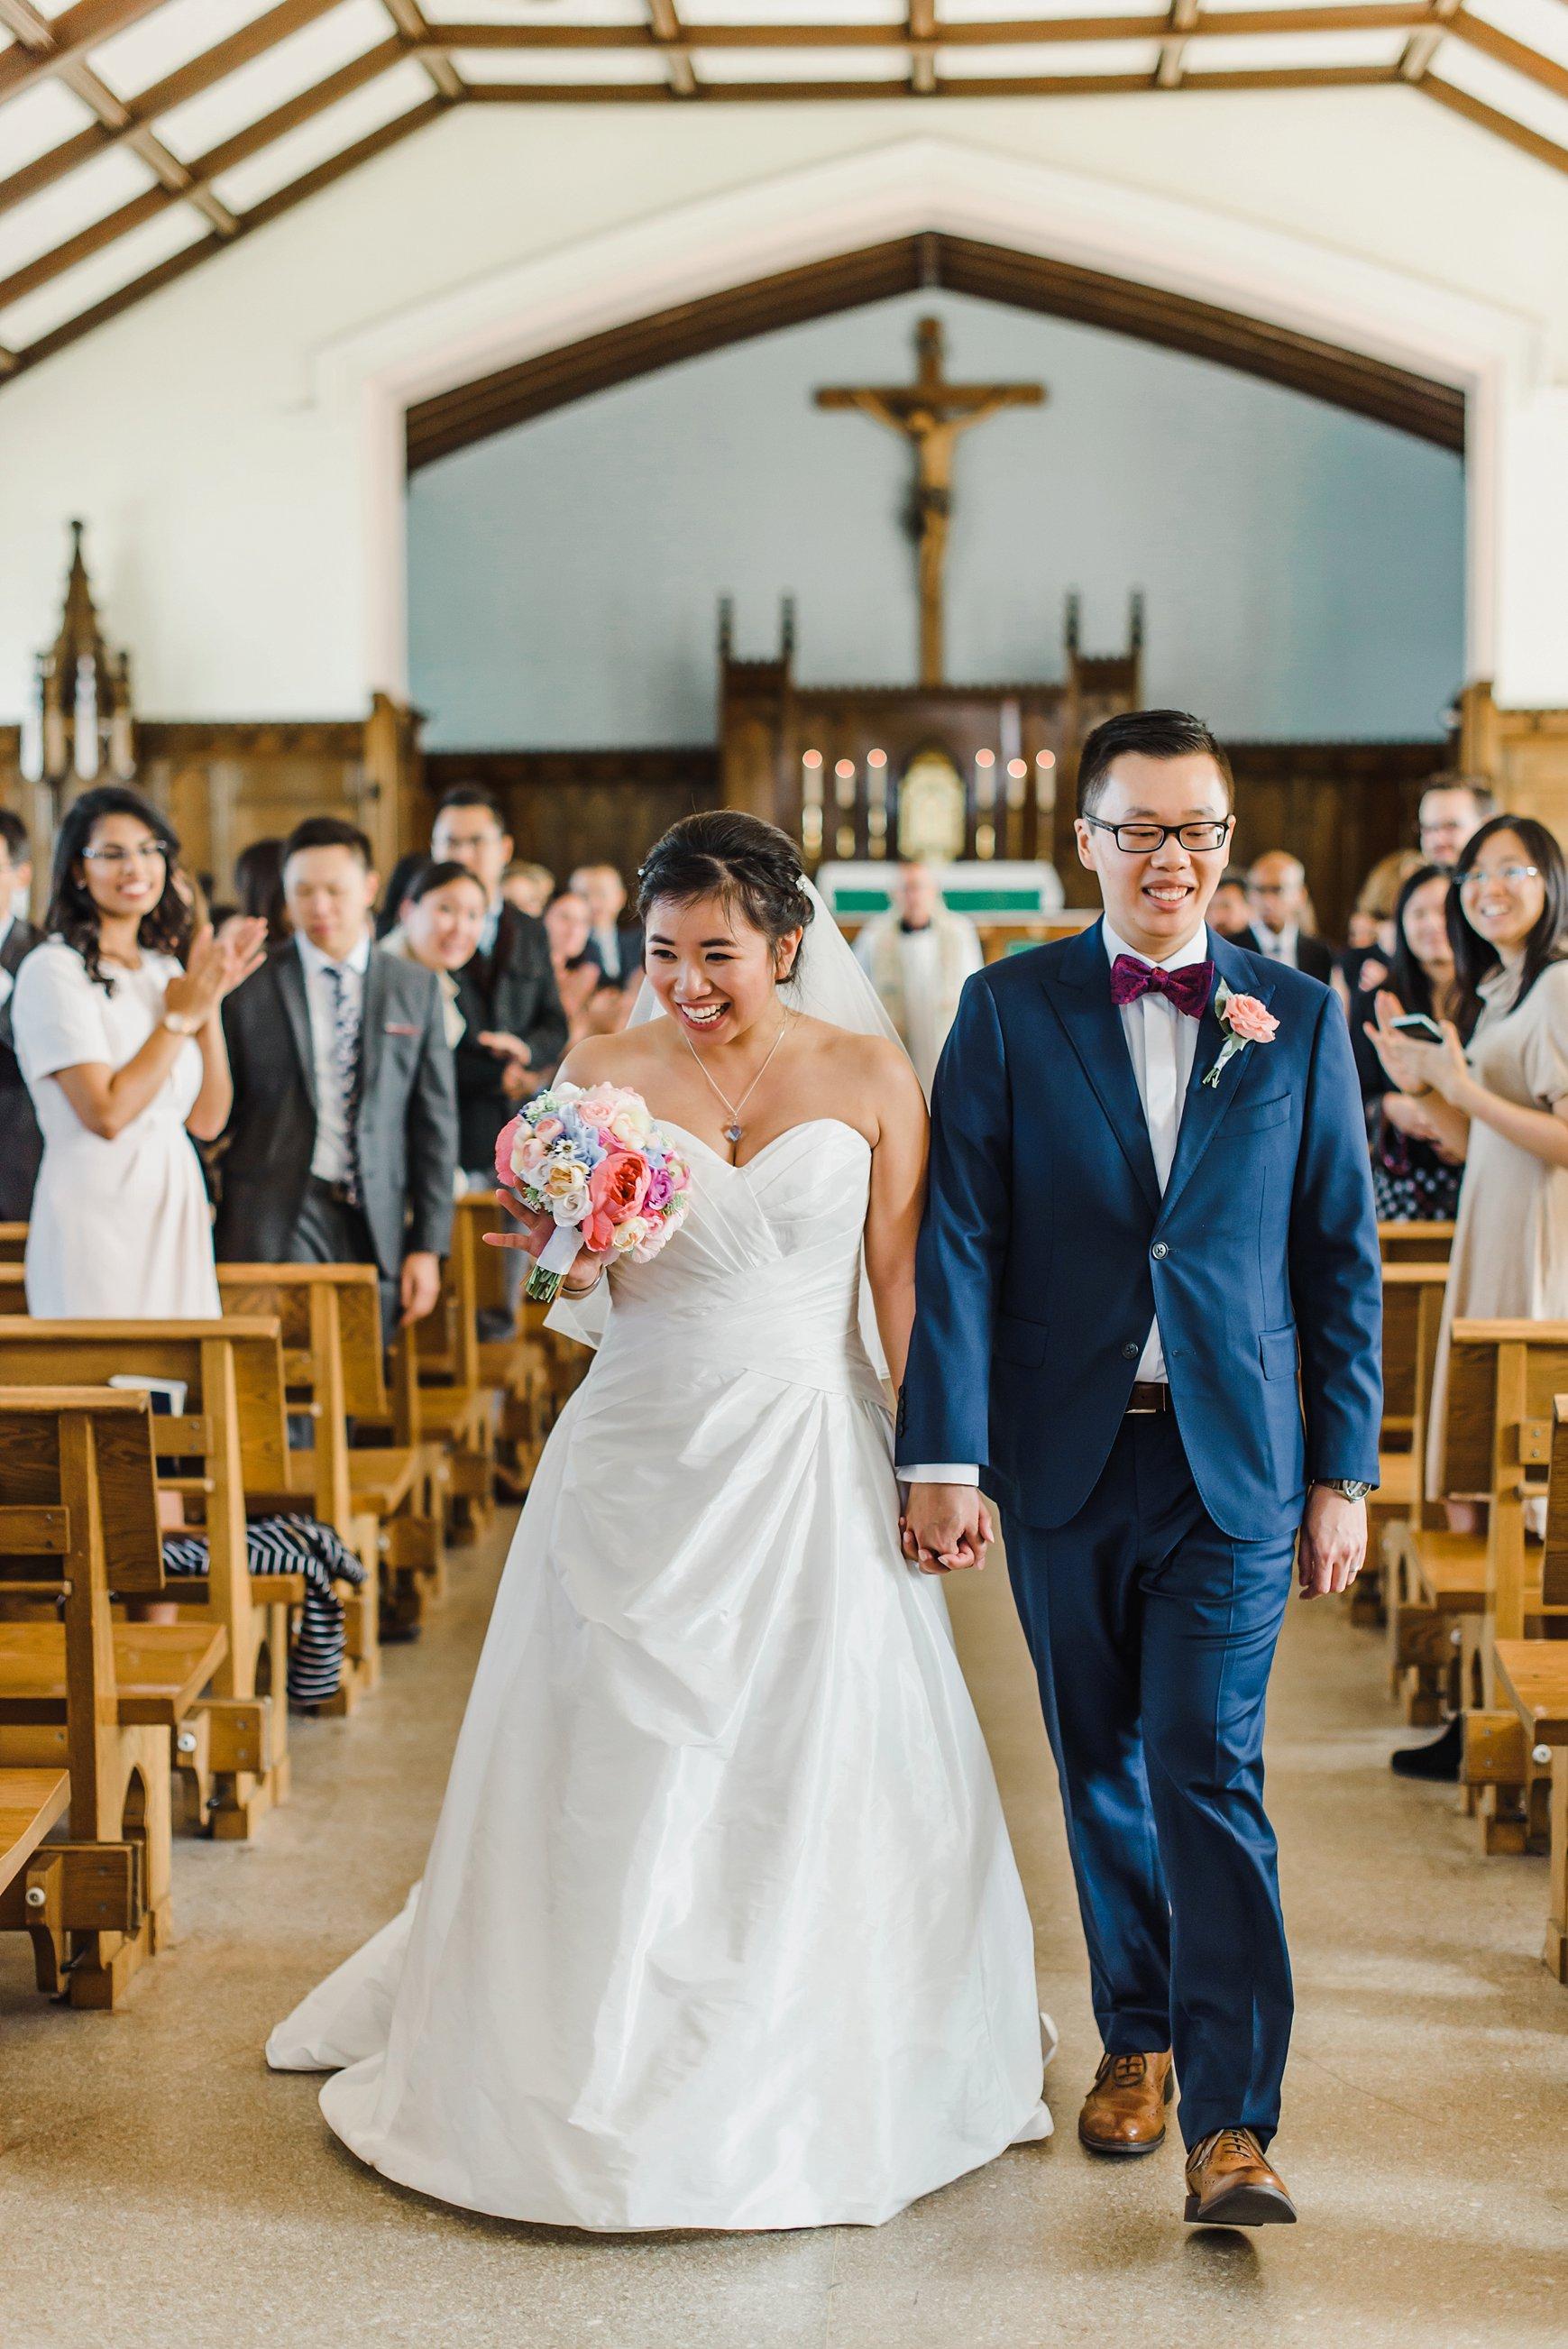 light airy indie fine art ottawa wedding photographer | Ali and Batoul Photography_1491.jpg